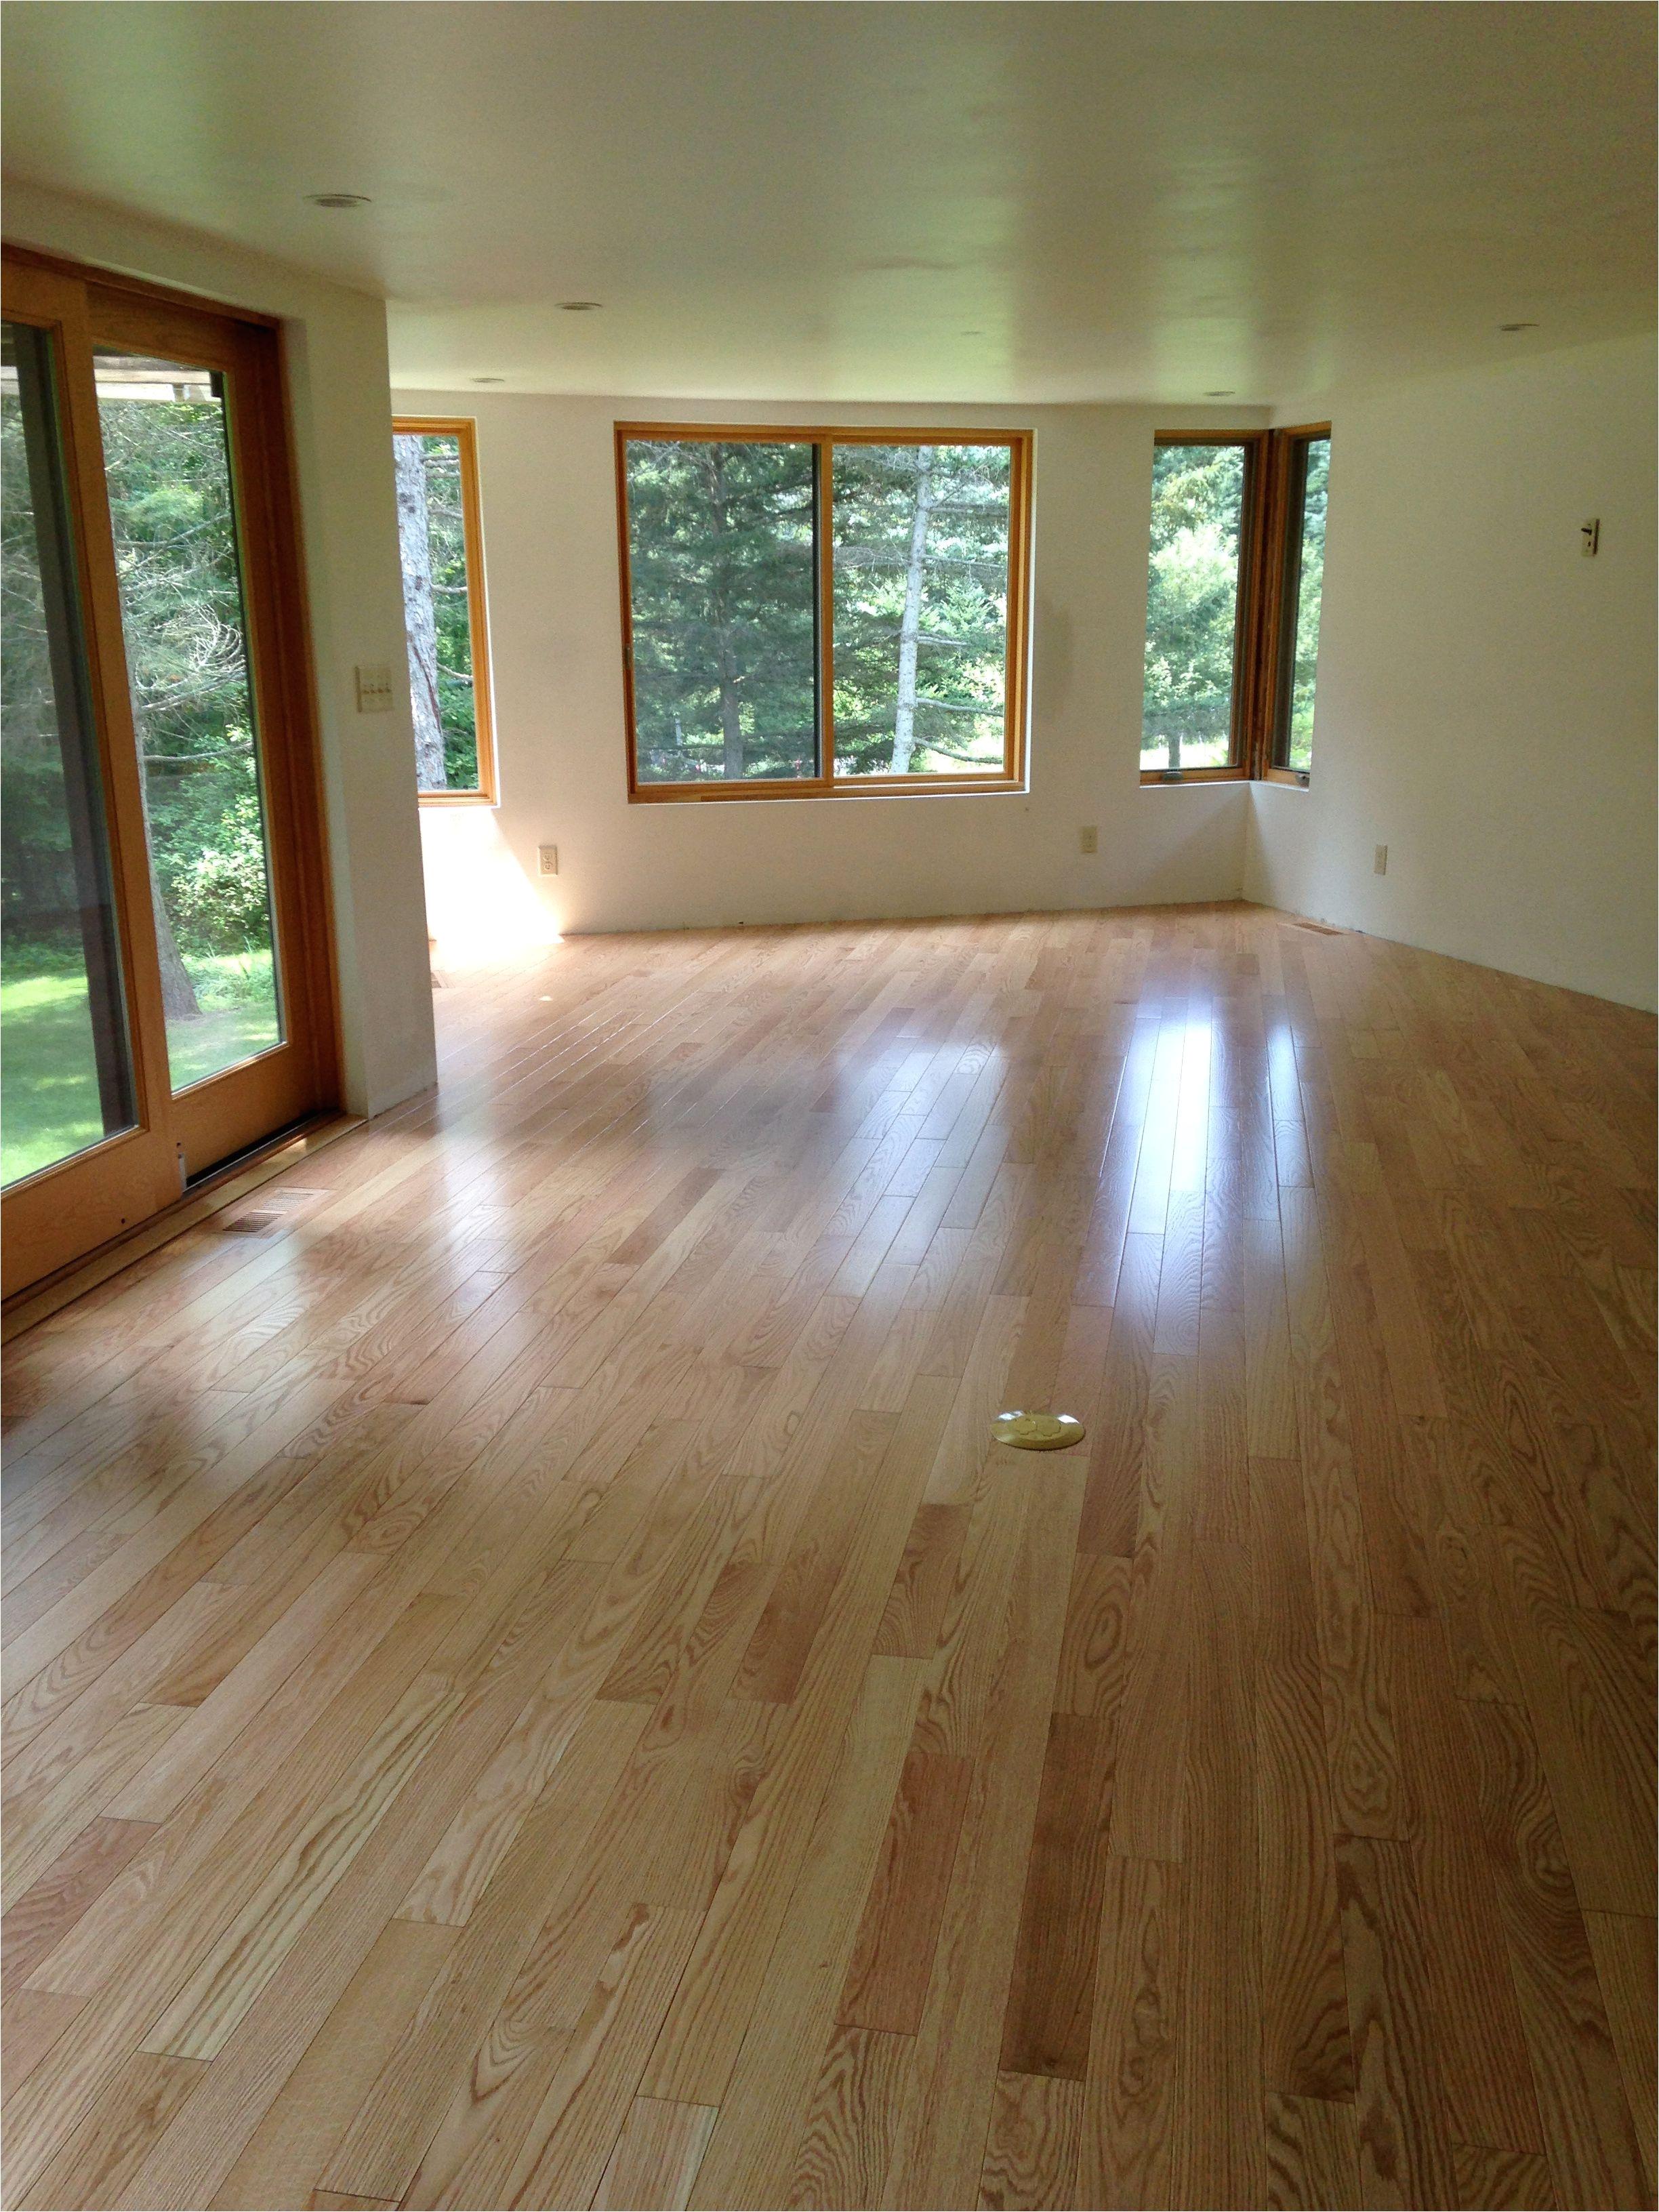 Best Type Of Polyurethane for Hardwood Floors Great Methods to Use for Refinishing Hardwood Floors Hardwood